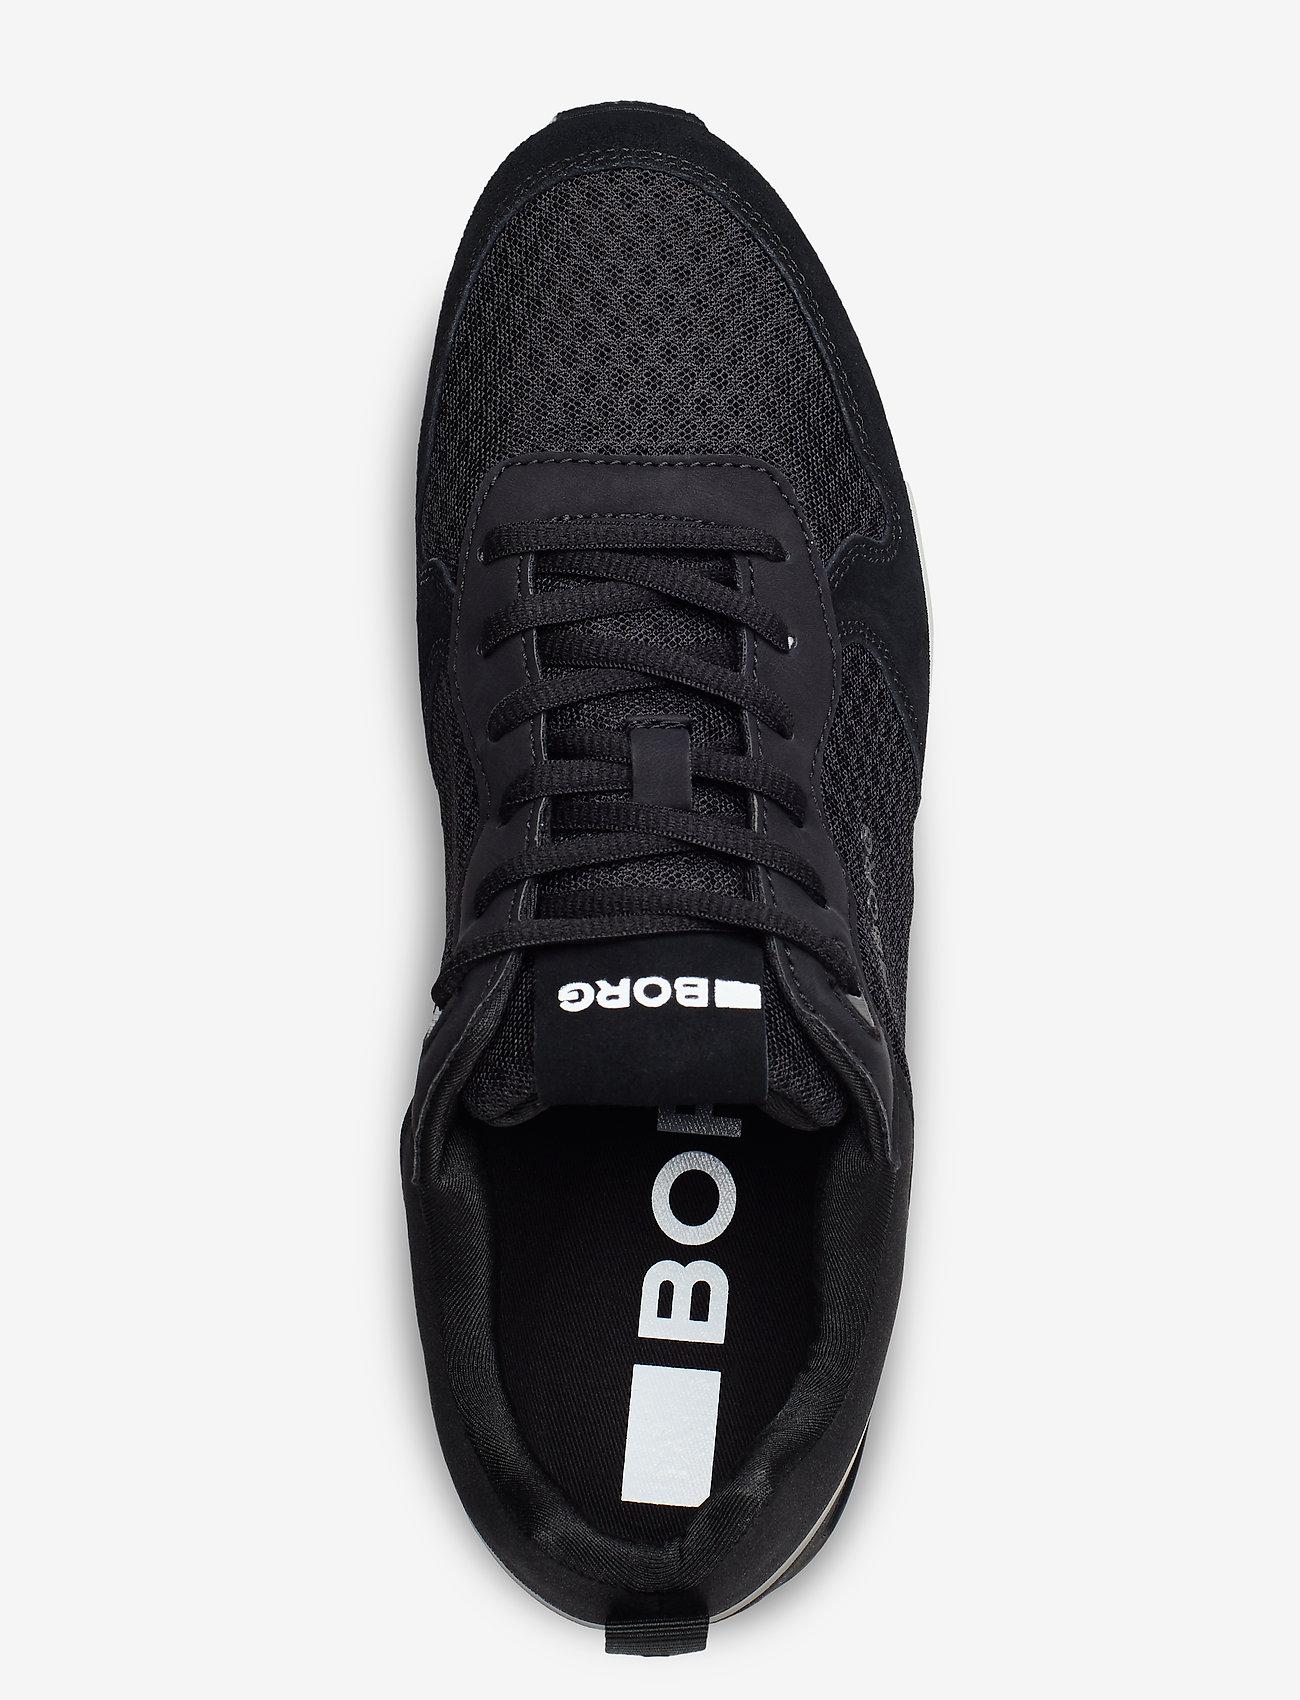 R910 Bsc M (Black) (420 kr) - Björn Borg